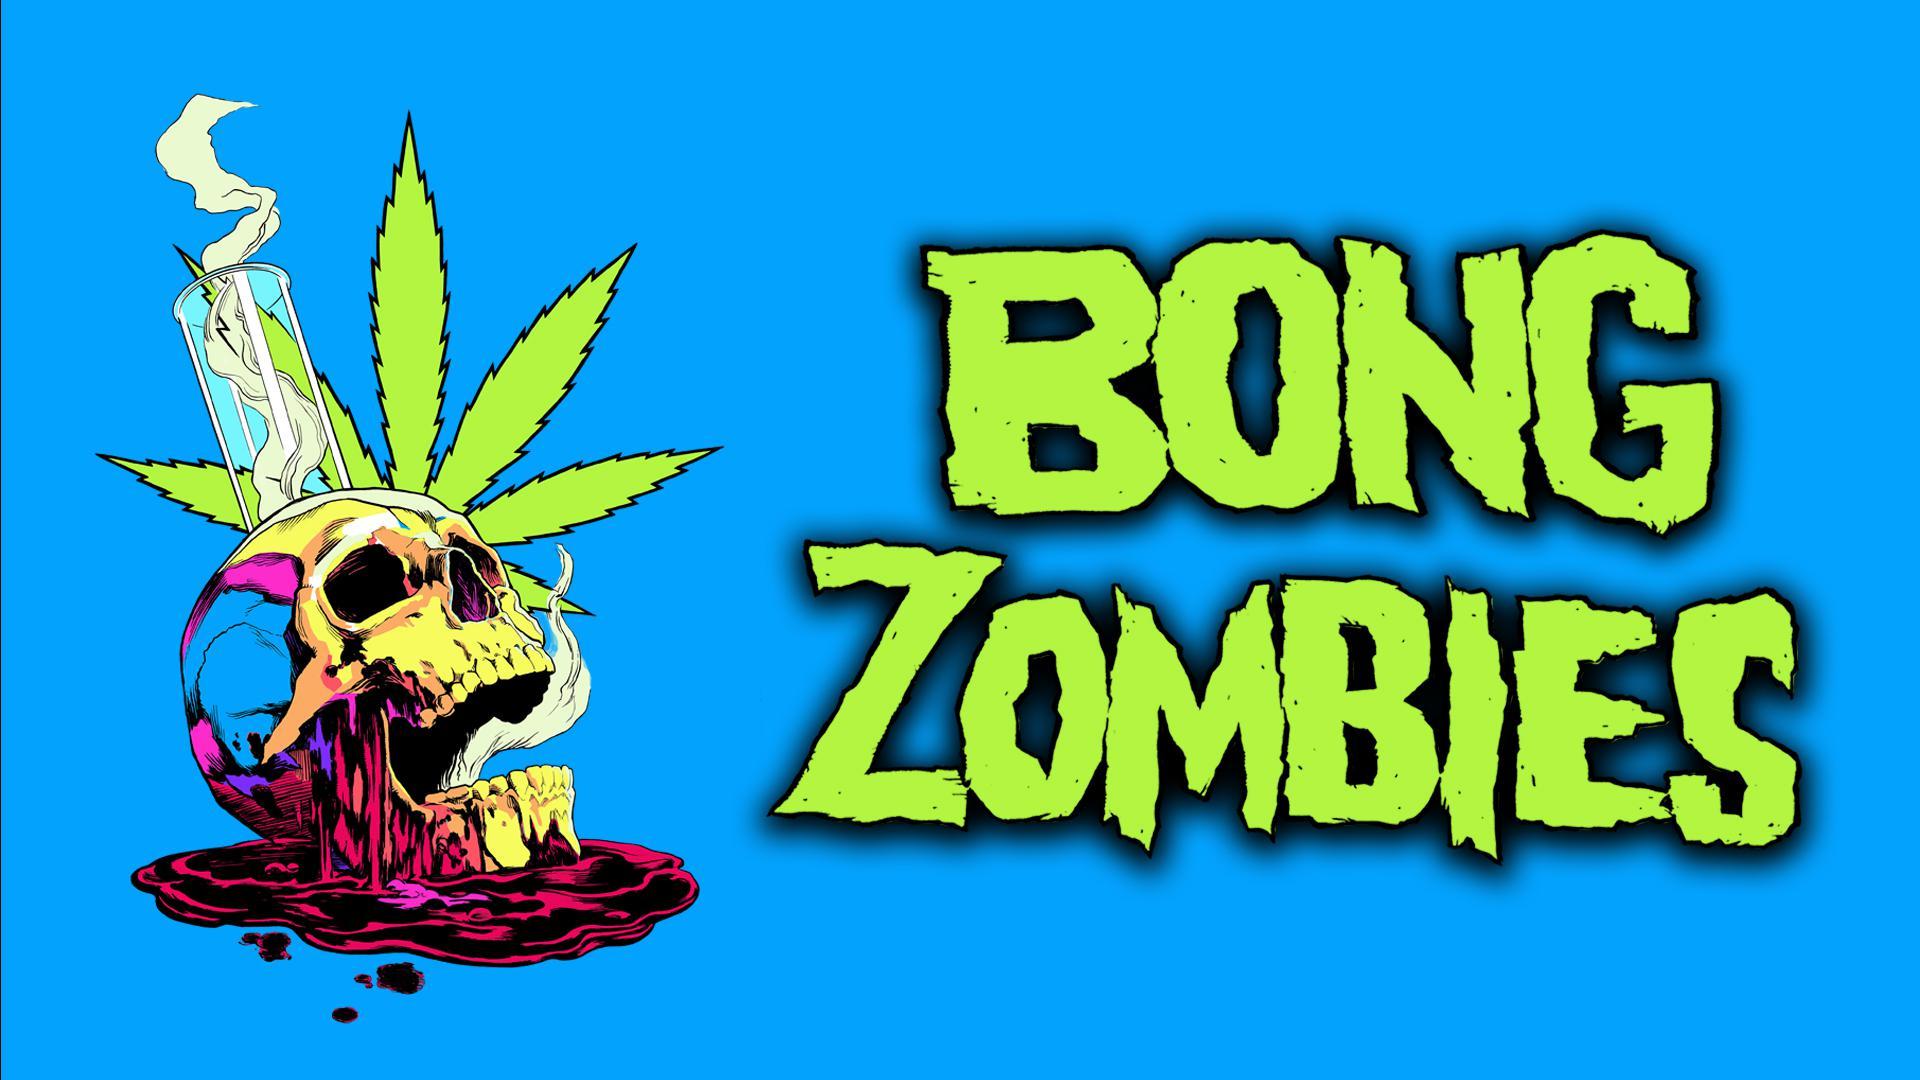 Bong Zombies